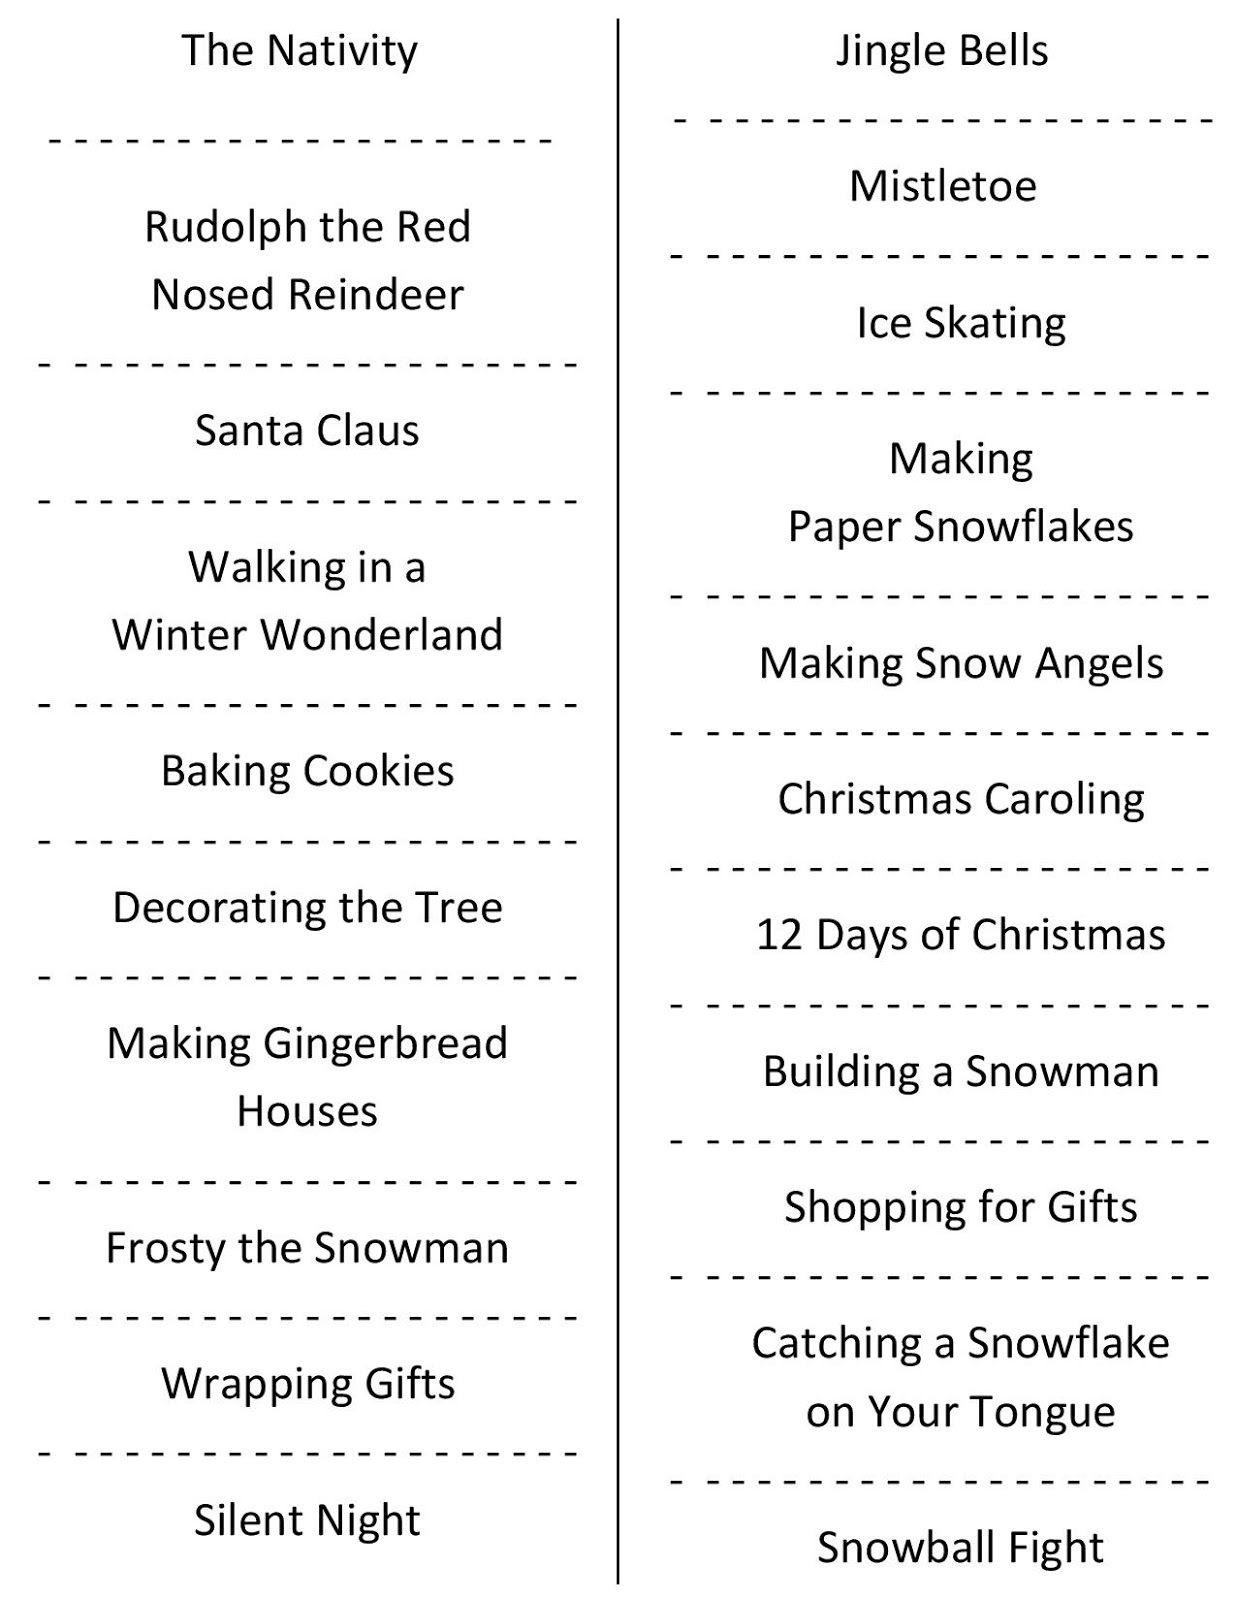 Christmas Charades (Free Printable Party Game) | Christmas | Daily - Holiday Office Party Games Free Printable